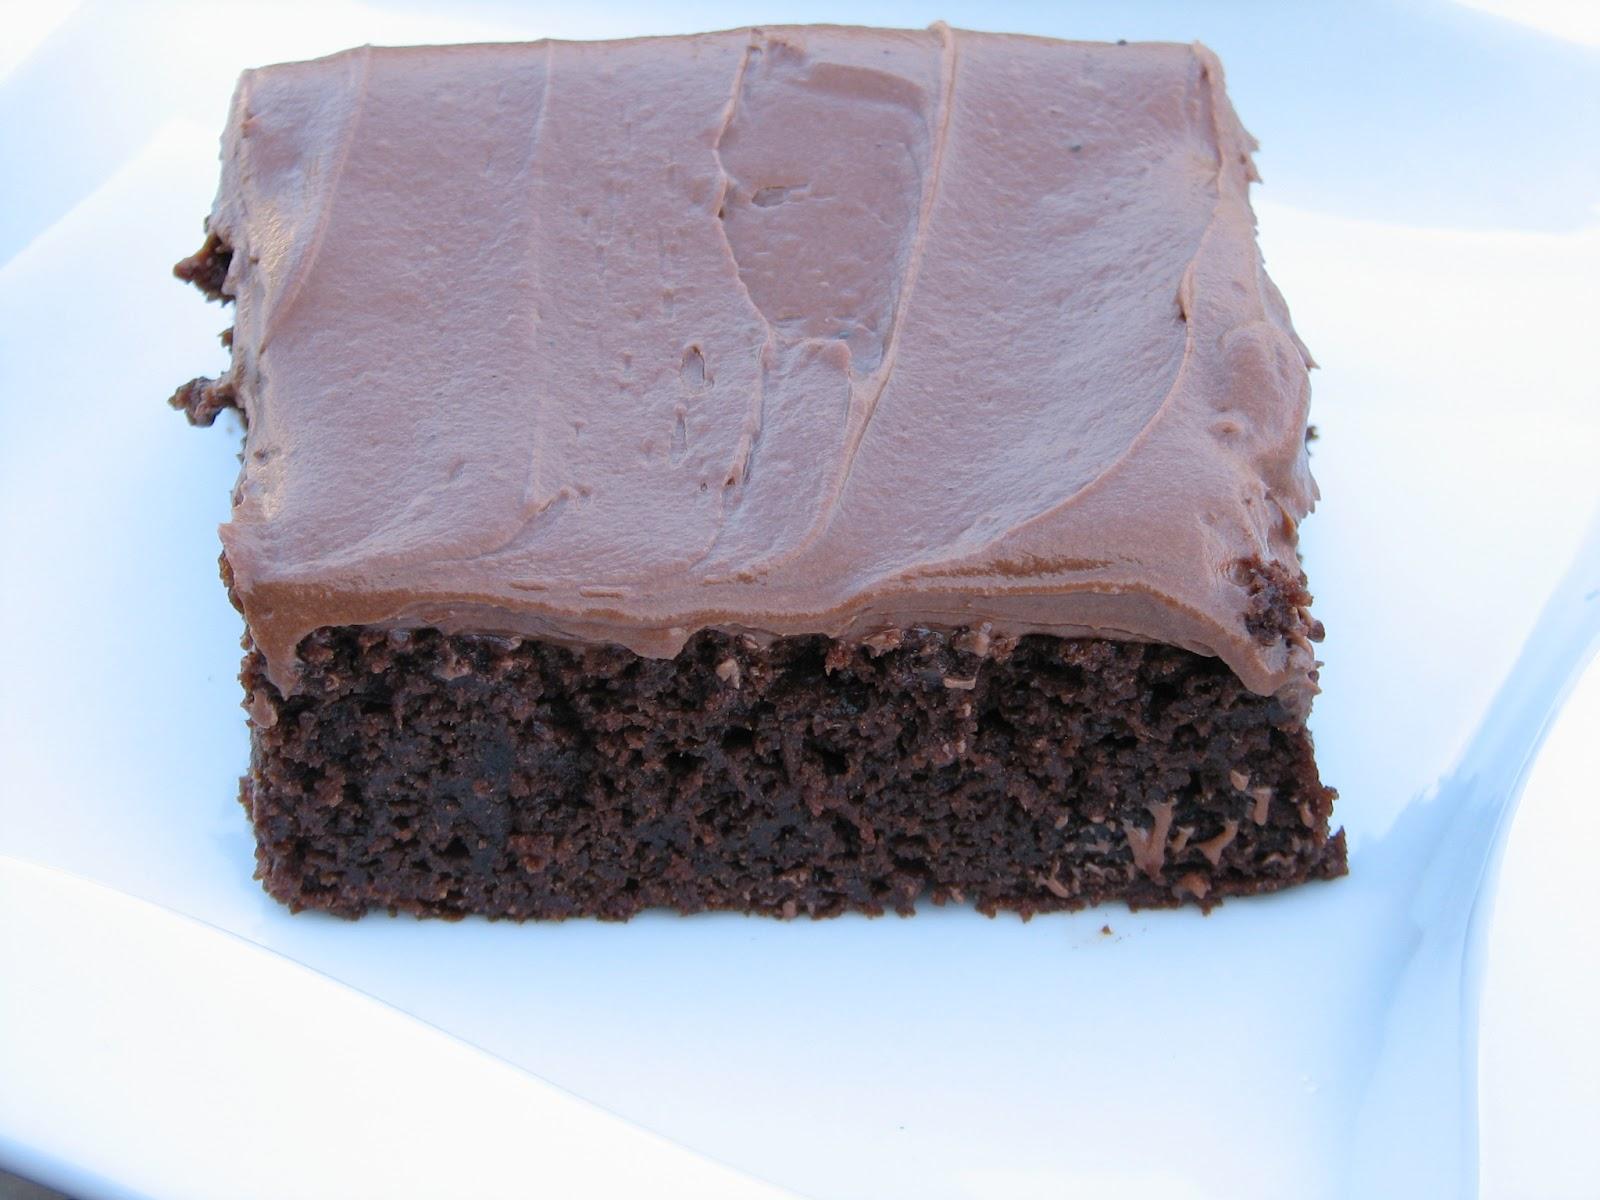 ... Free Desserts made Delicious: Gluten Free Hershey's Chocolate Cake